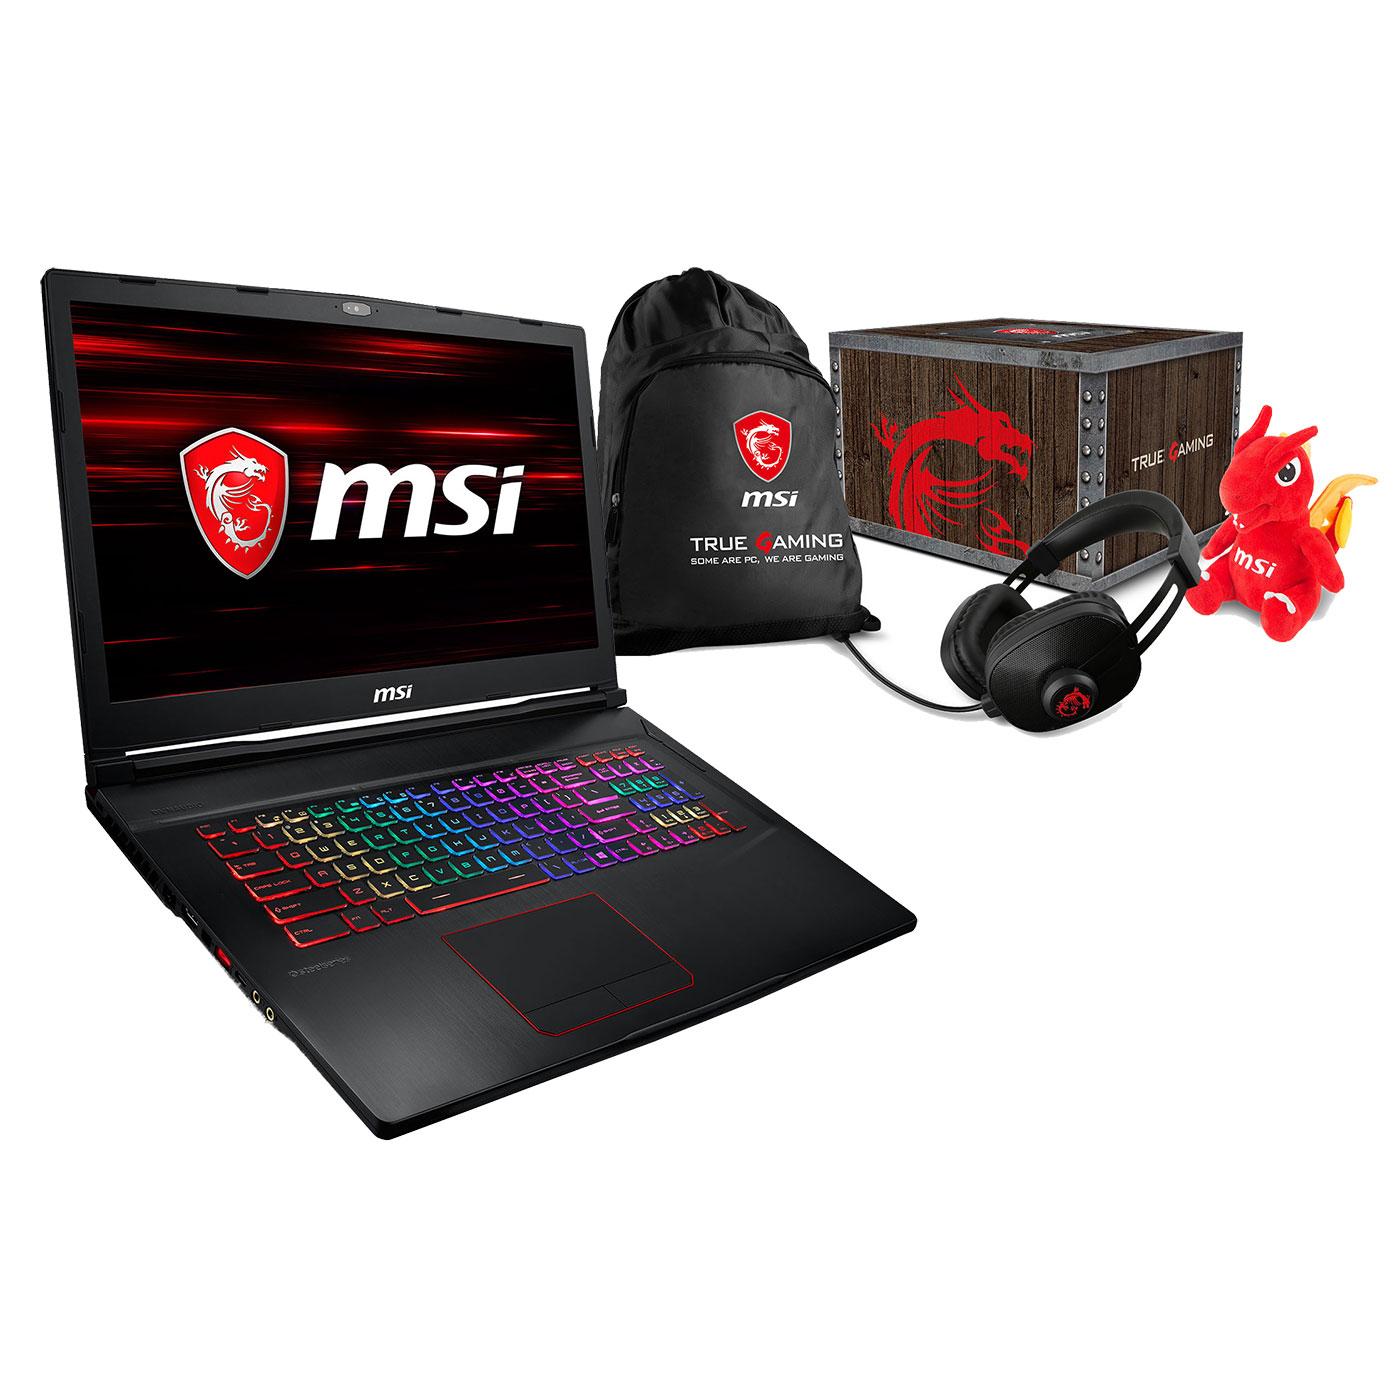 "PC portable MSI GE73 8RF-455XFR Raider RGB + MSI Loot Box - Level 2 OFFERTE ! Intel Core i7-8750H 8 Go SSD 256 Go + HDD 1 To 17.3"" LED Full HD 120 Hz NVIDIA GeForce GTX 1070 8 Go Wi-Fi AC/Bluetooth Webcam FreeDOS (garantie constructeur 2 ans)"